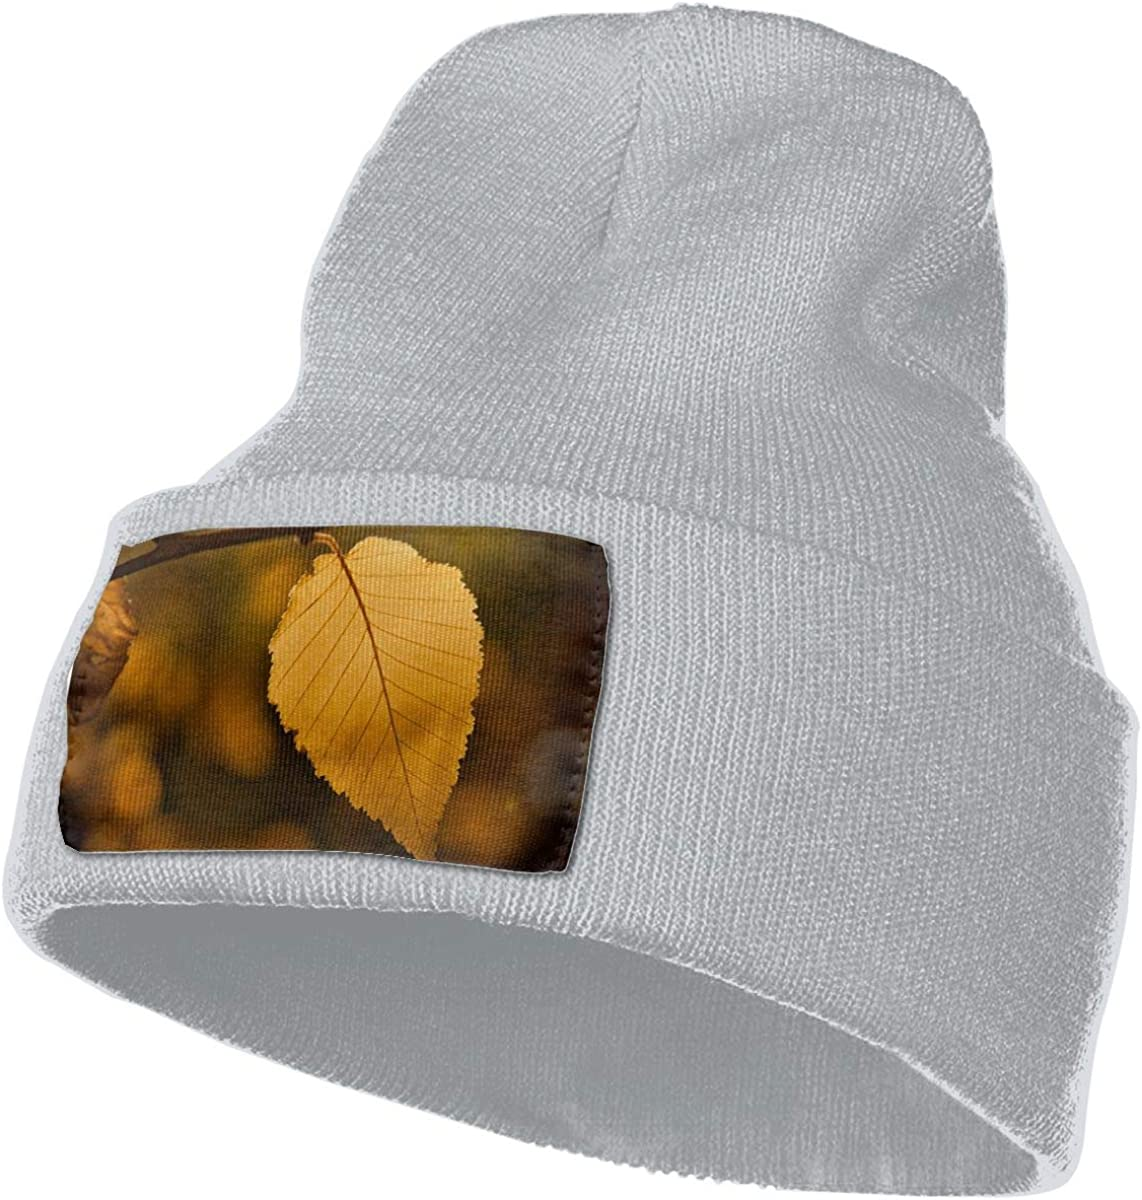 Yubb7E Leaves-Fall Warm Knit Winter Solid Beanie Hat Unisex Skull Cap